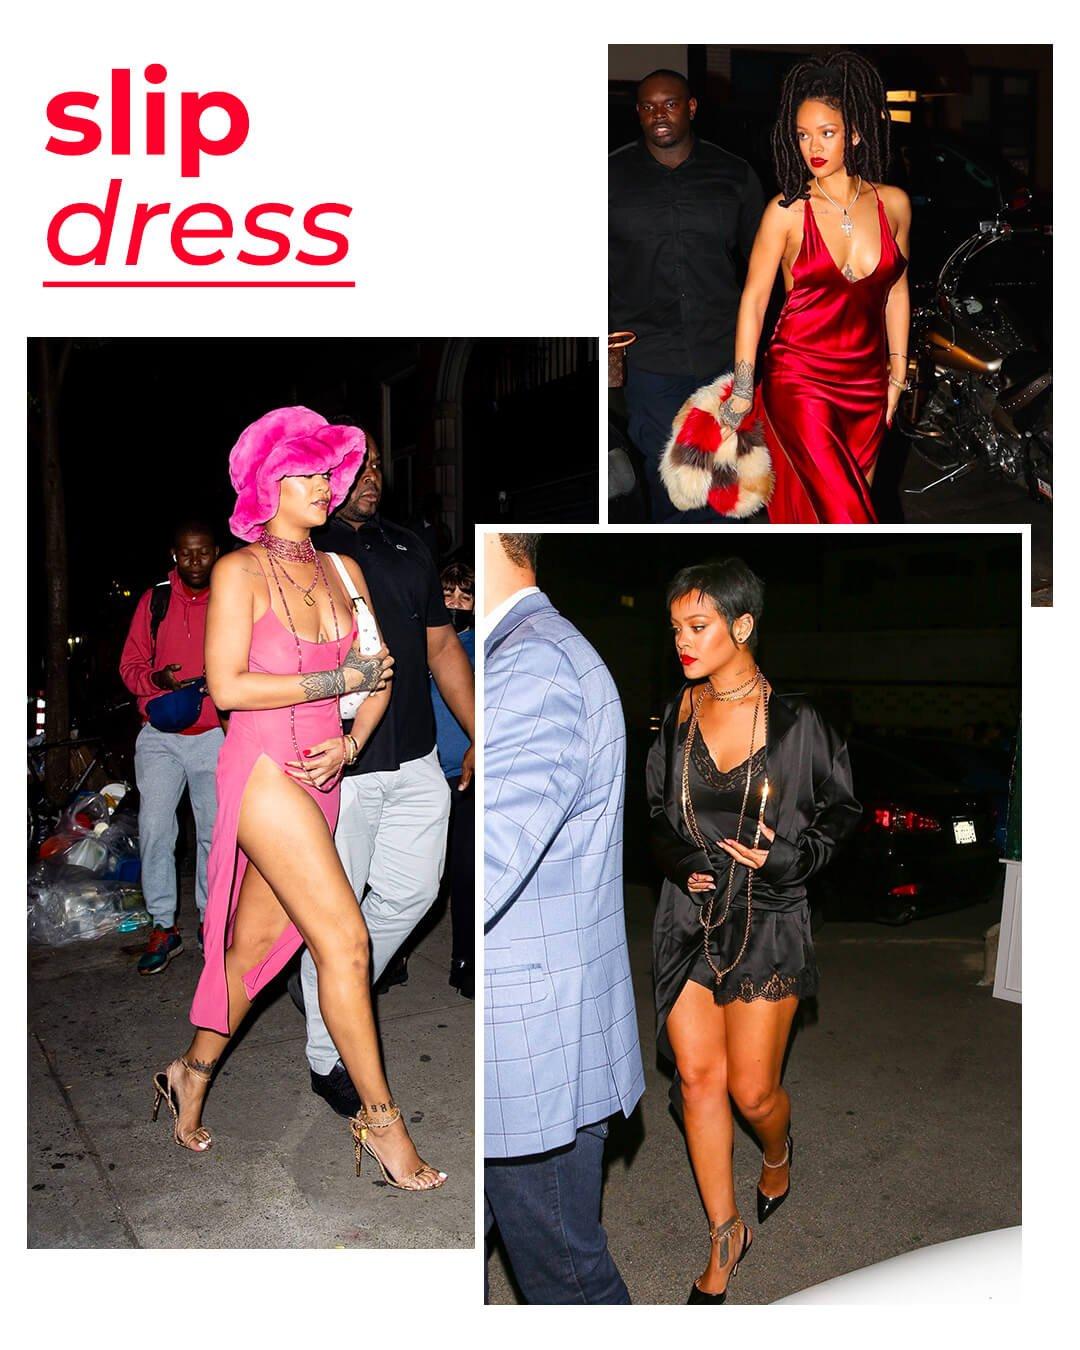 Rihanna - Rihanna - Rihanna - Inverno - Street Style - https://stealthelook.com.br